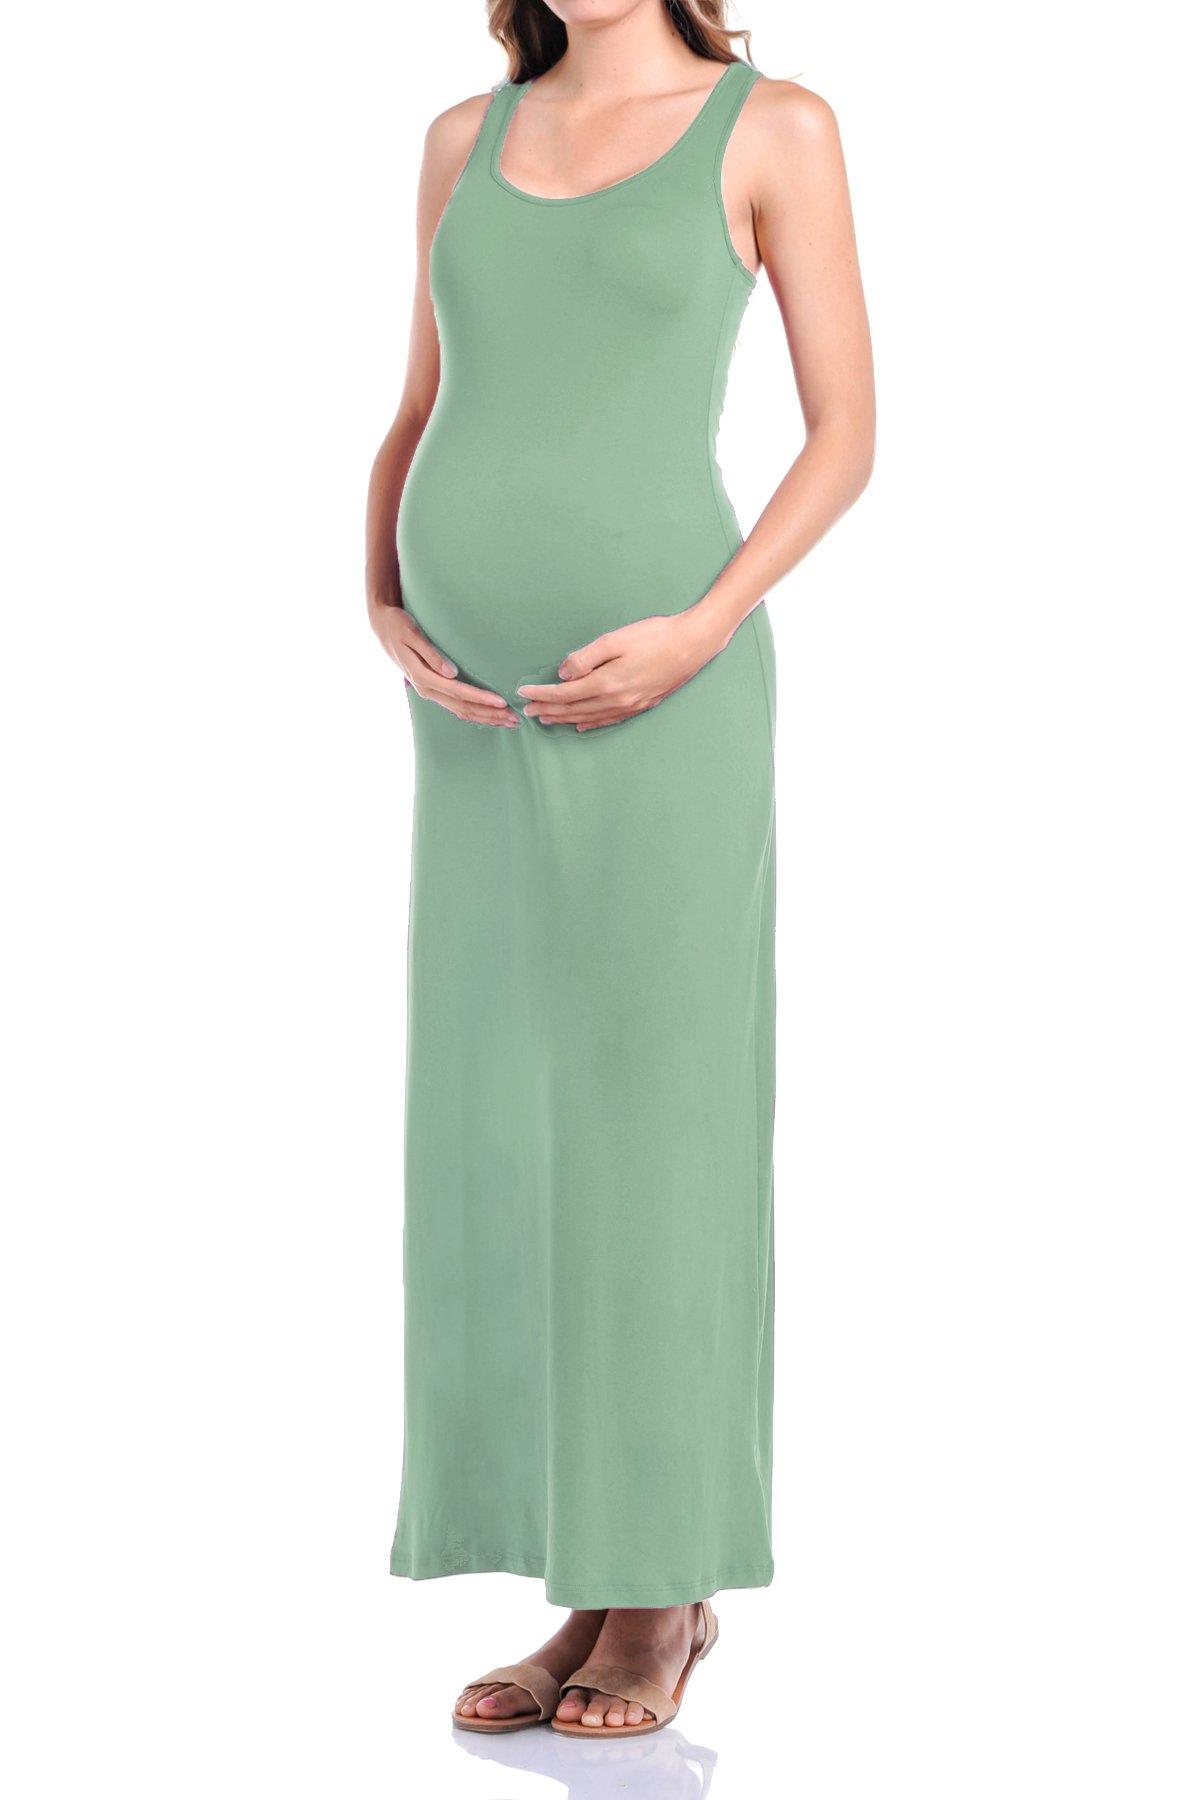 Beachcoco Women's Maternity Comfortable Jersey Maxi Dress (L, Sage)